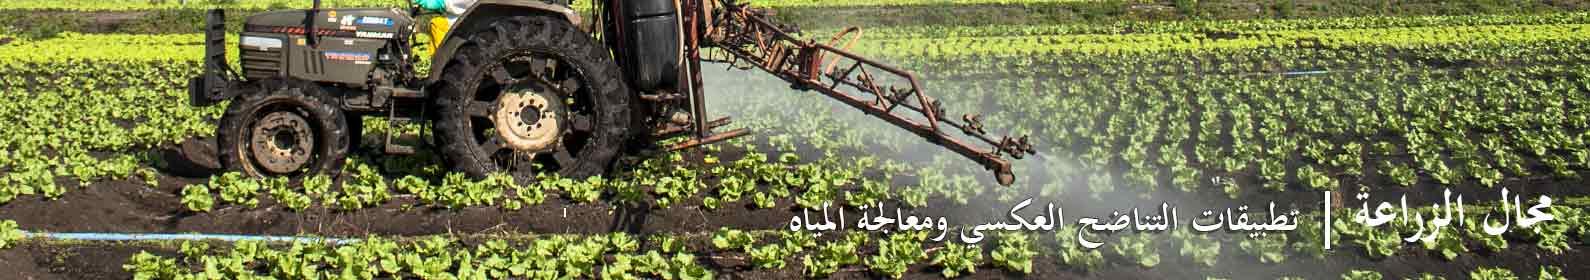 -agriculture.jpg